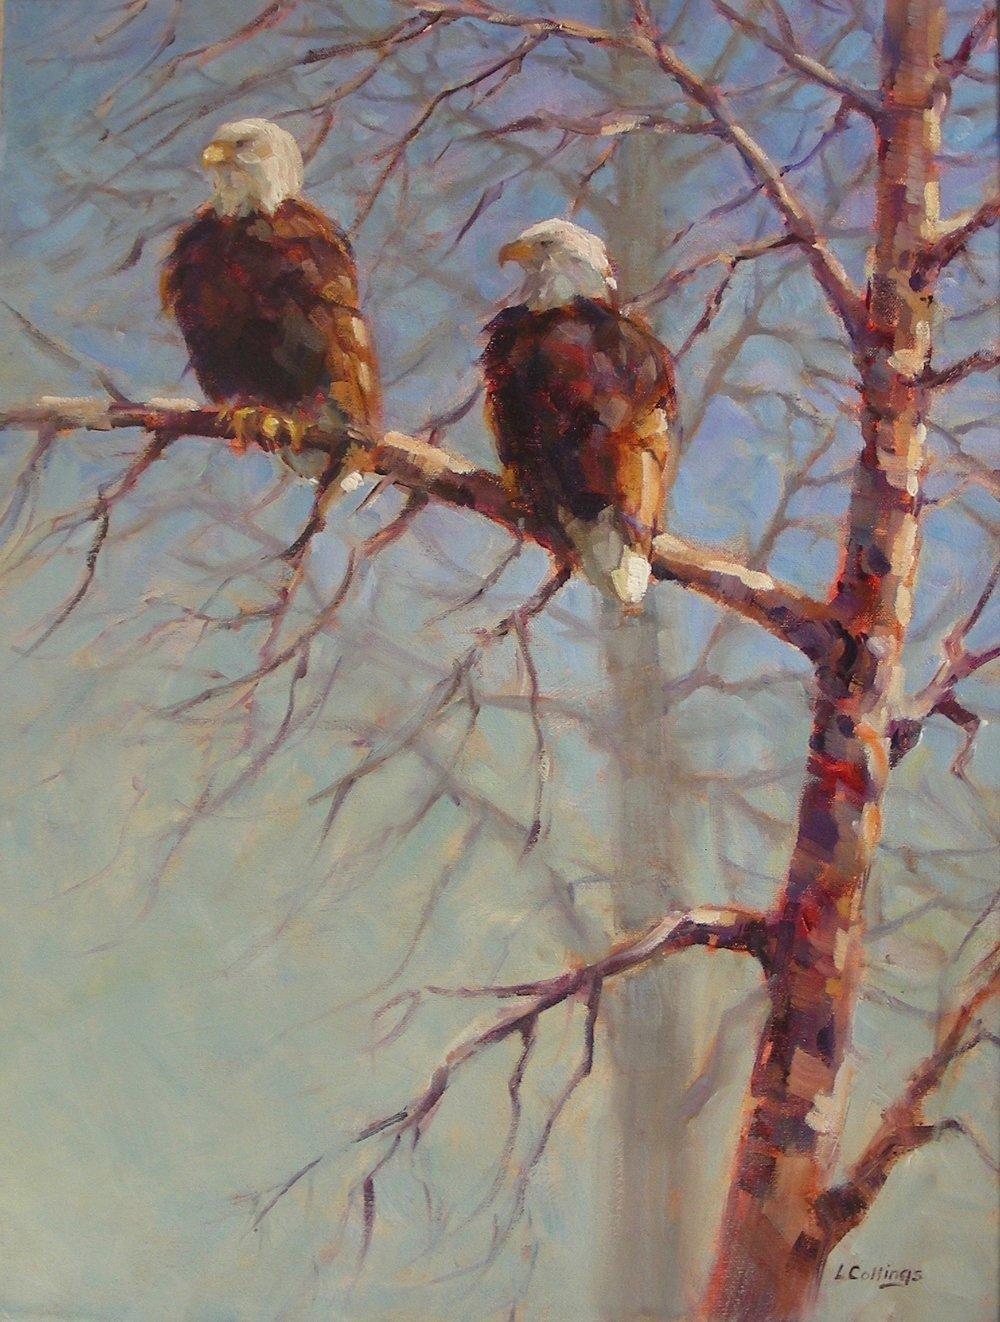 "1 - On High - 24 x 18"", oil on canvas, 4650-"